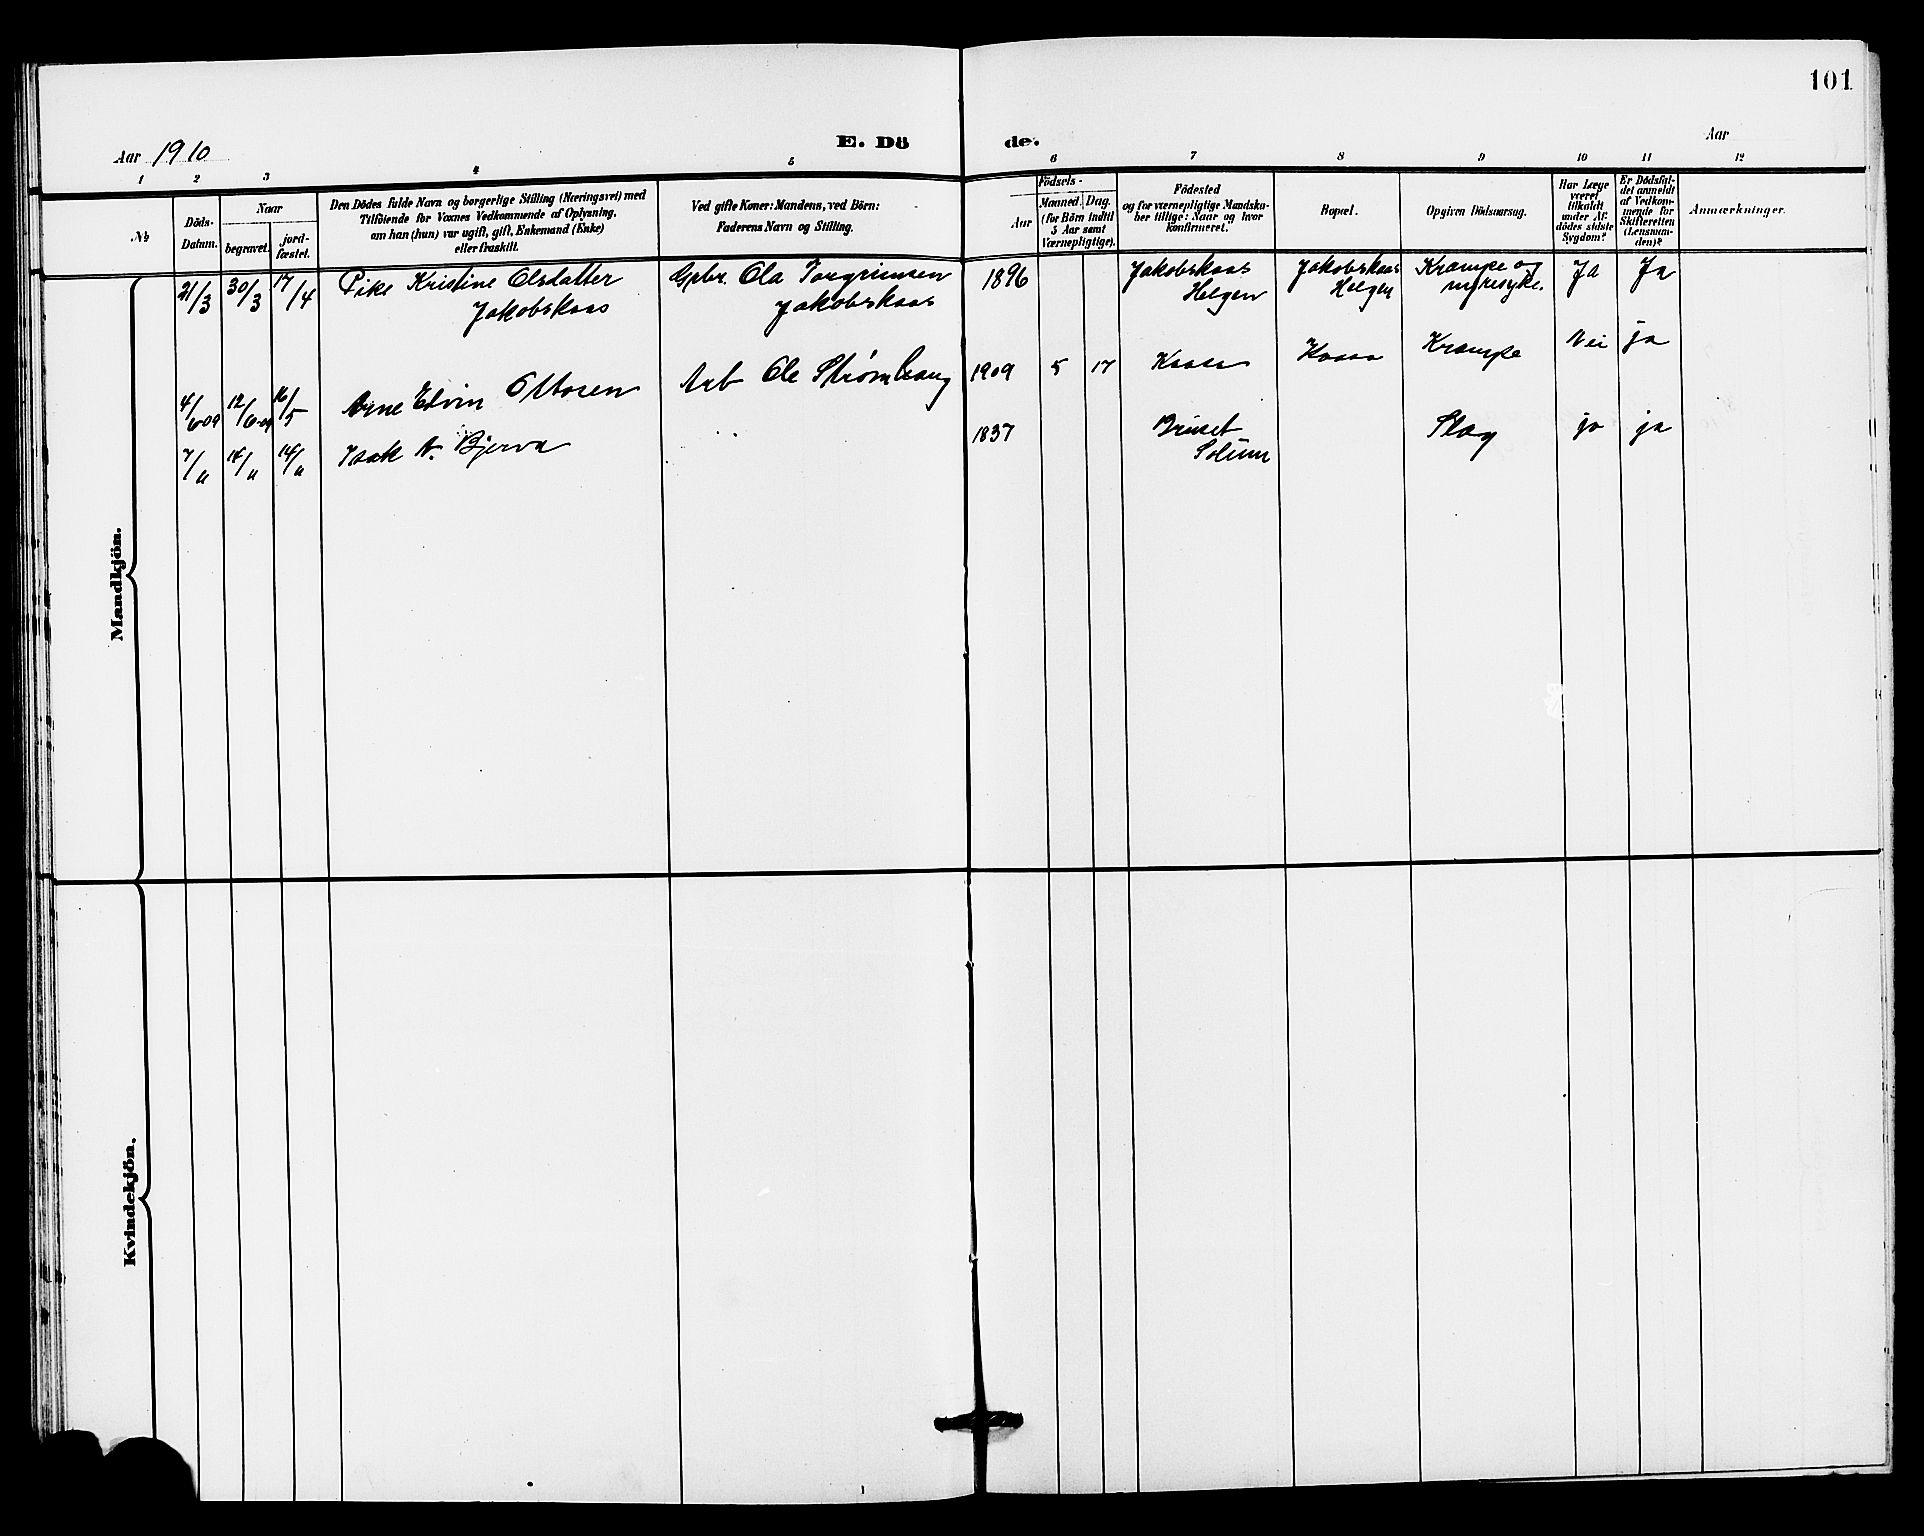 SAKO, Holla kirkebøker, G/Gb/L0002: Klokkerbok nr. II 2, 1897-1913, s. 101